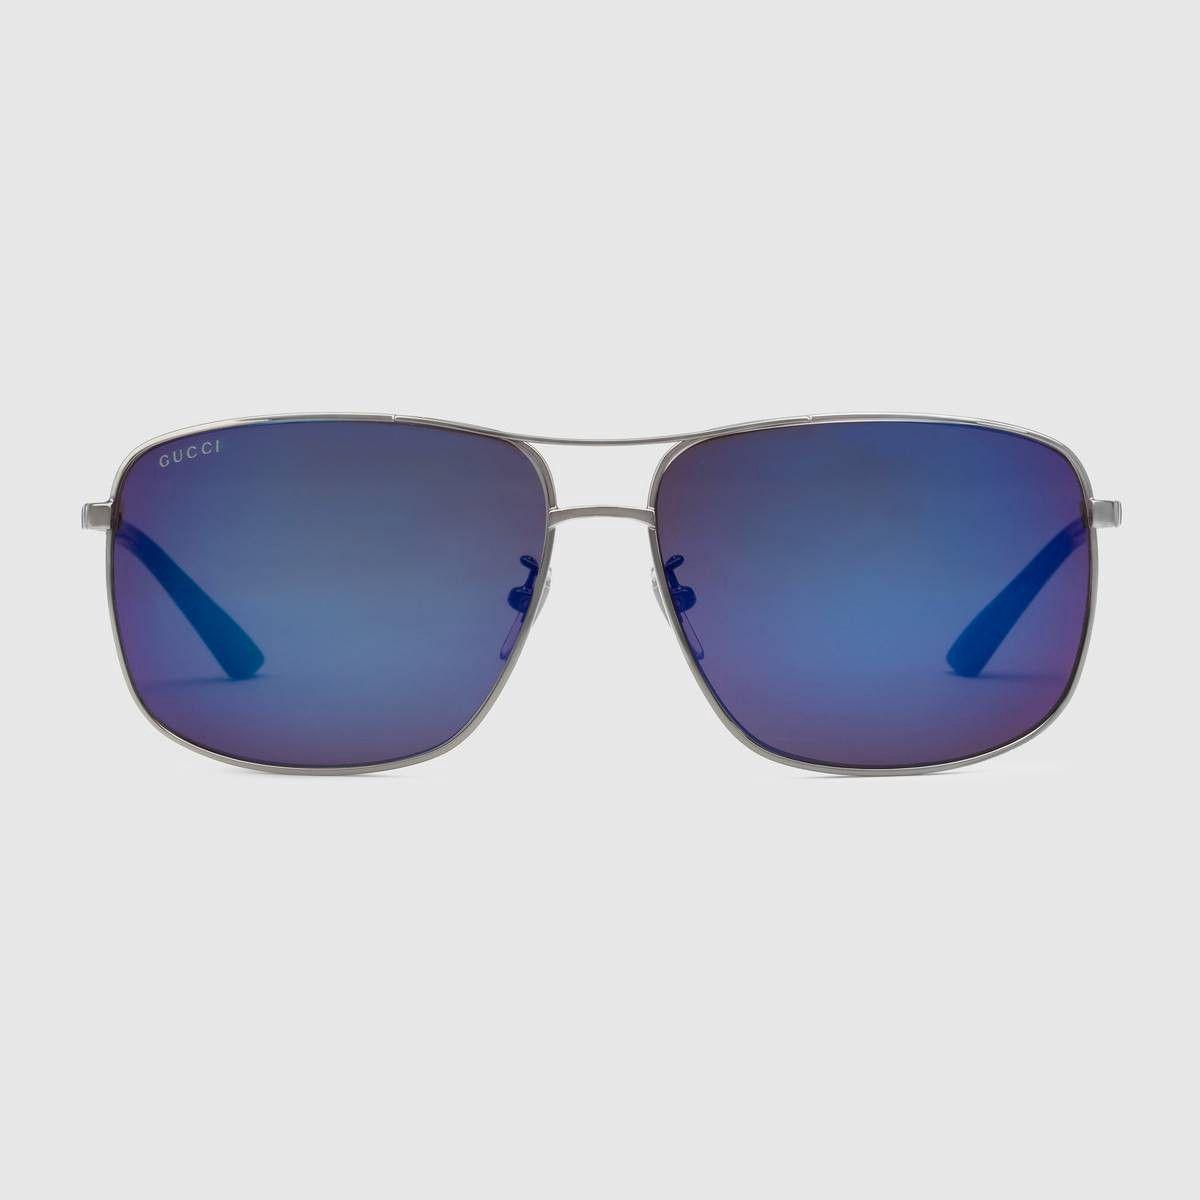 9b149fb098 GUCCI Specialized fit square-frame metal sunglasses - ruthenium metal.   gucci